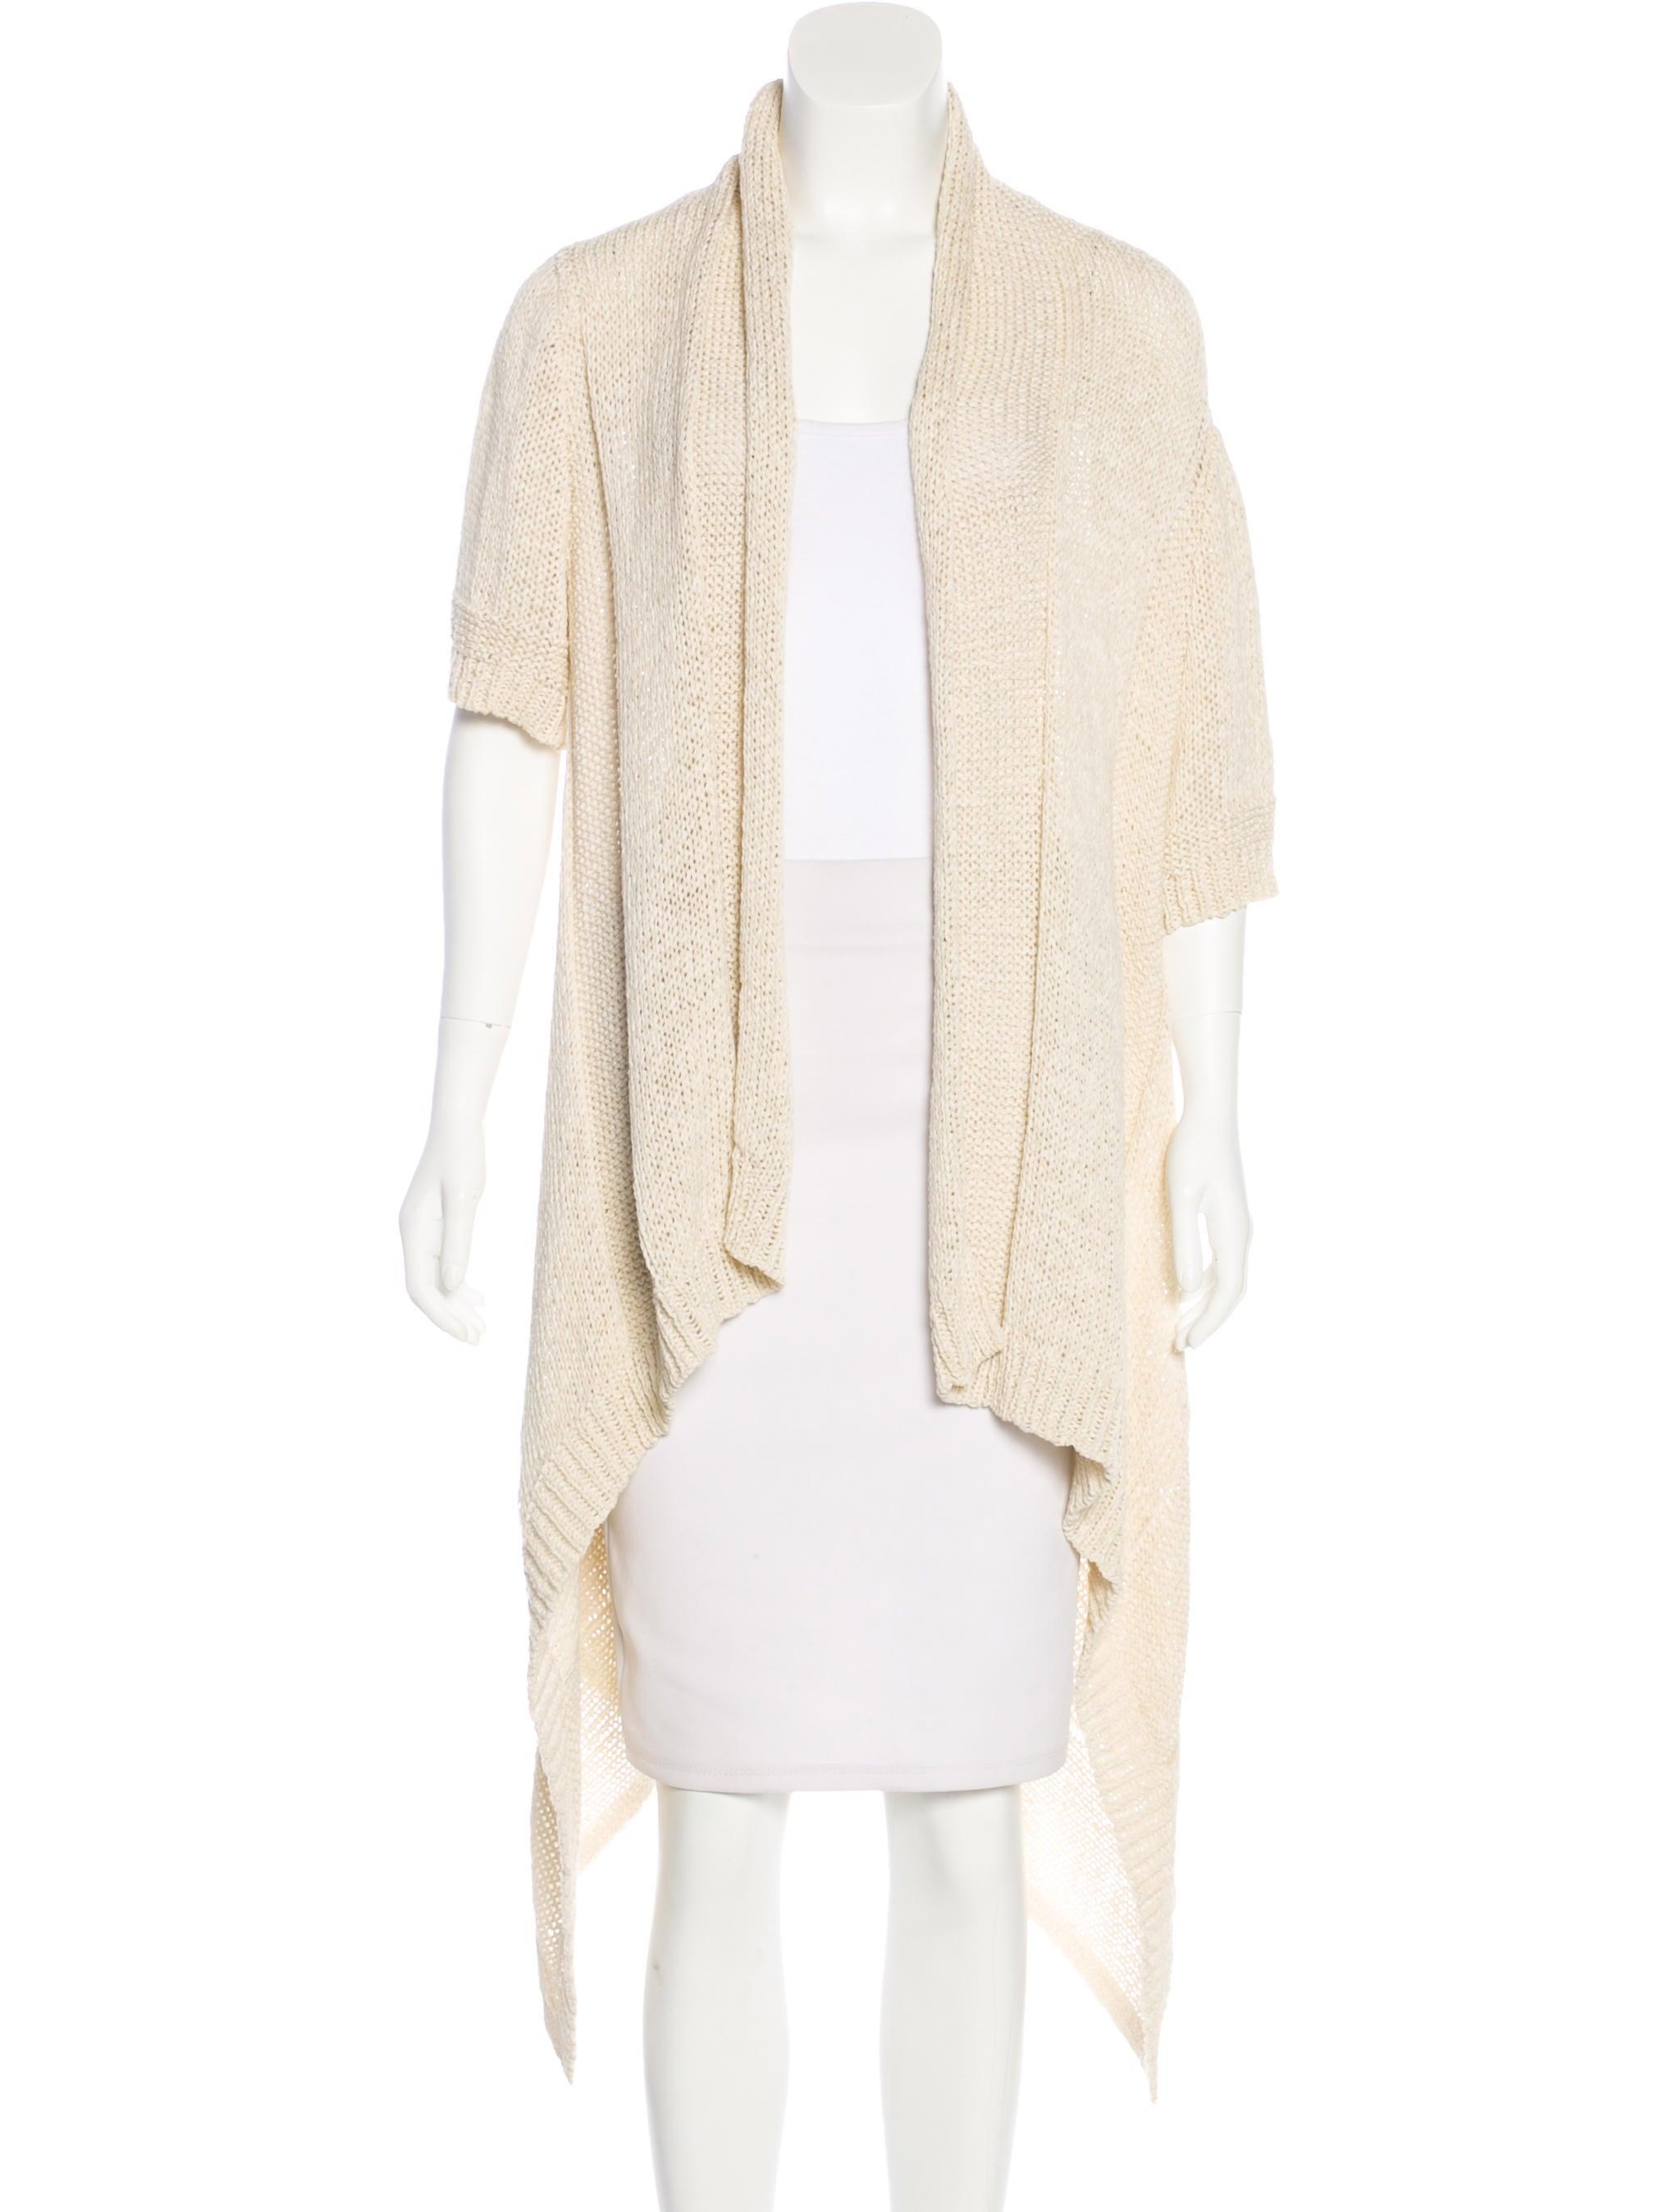 long patchwork acevog sleeve open in ladies cardigans thin irregular s chiffon cardigan from women autumn summer sweaters draped hem front item drapes